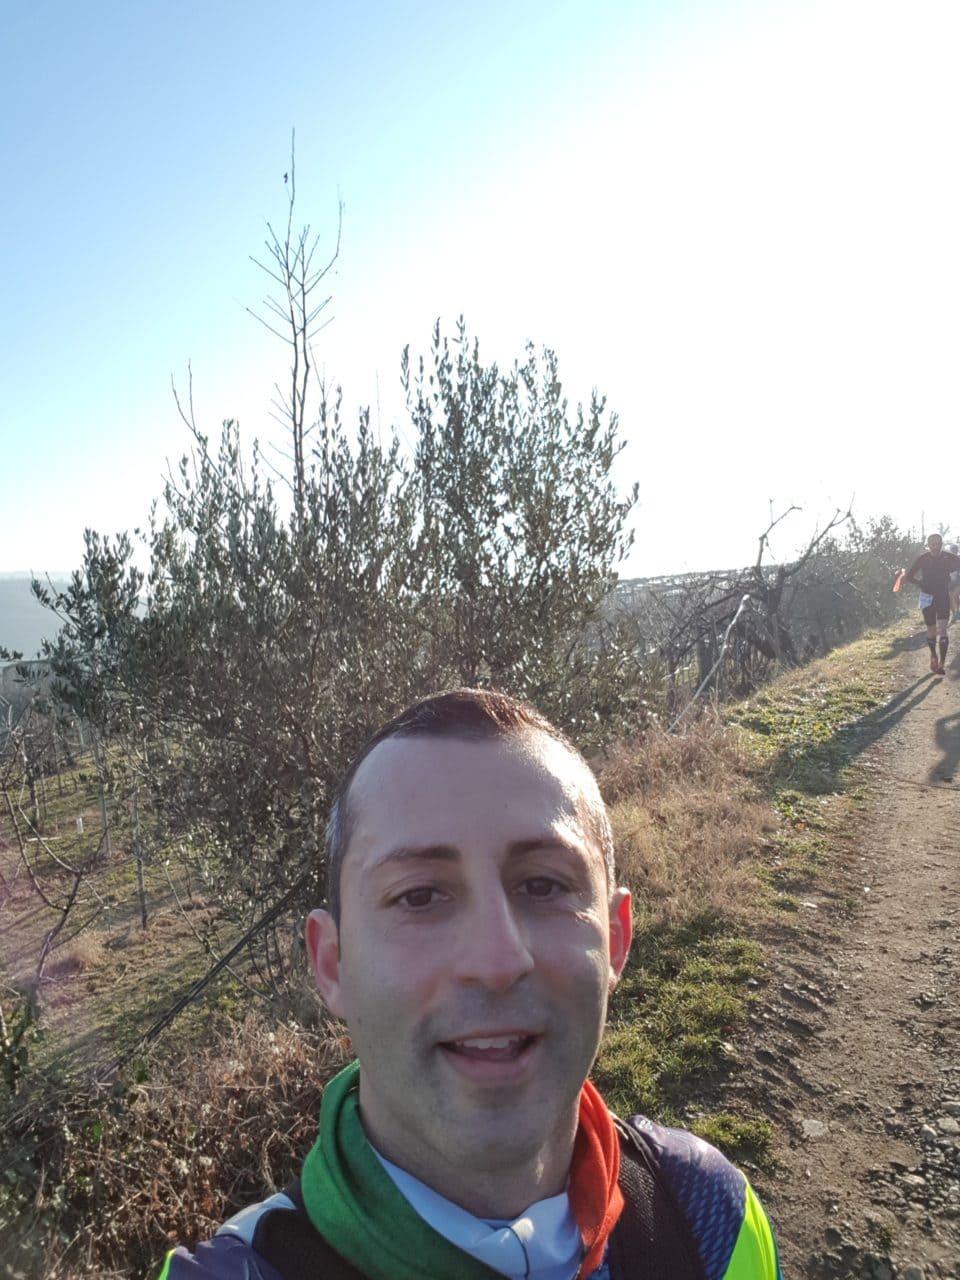 runnerpercaso montefortiana 2018 (1)